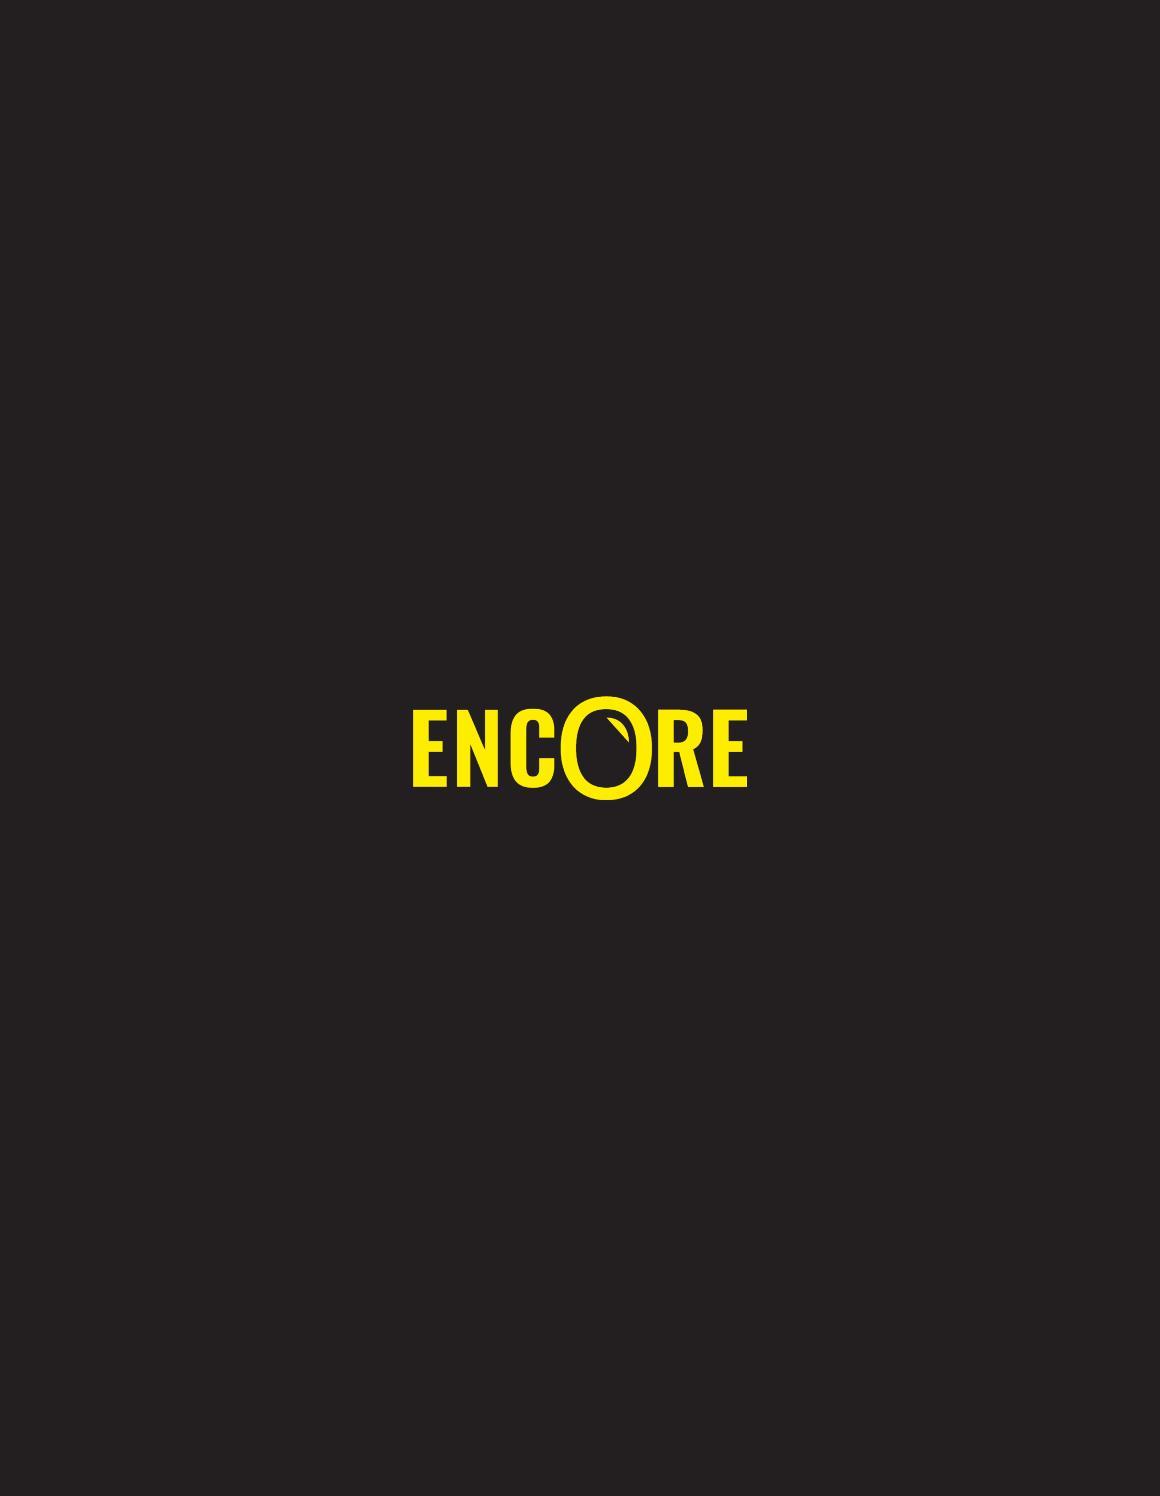 Encore by Simona Nuccio - issuu 5c19a0efc83b